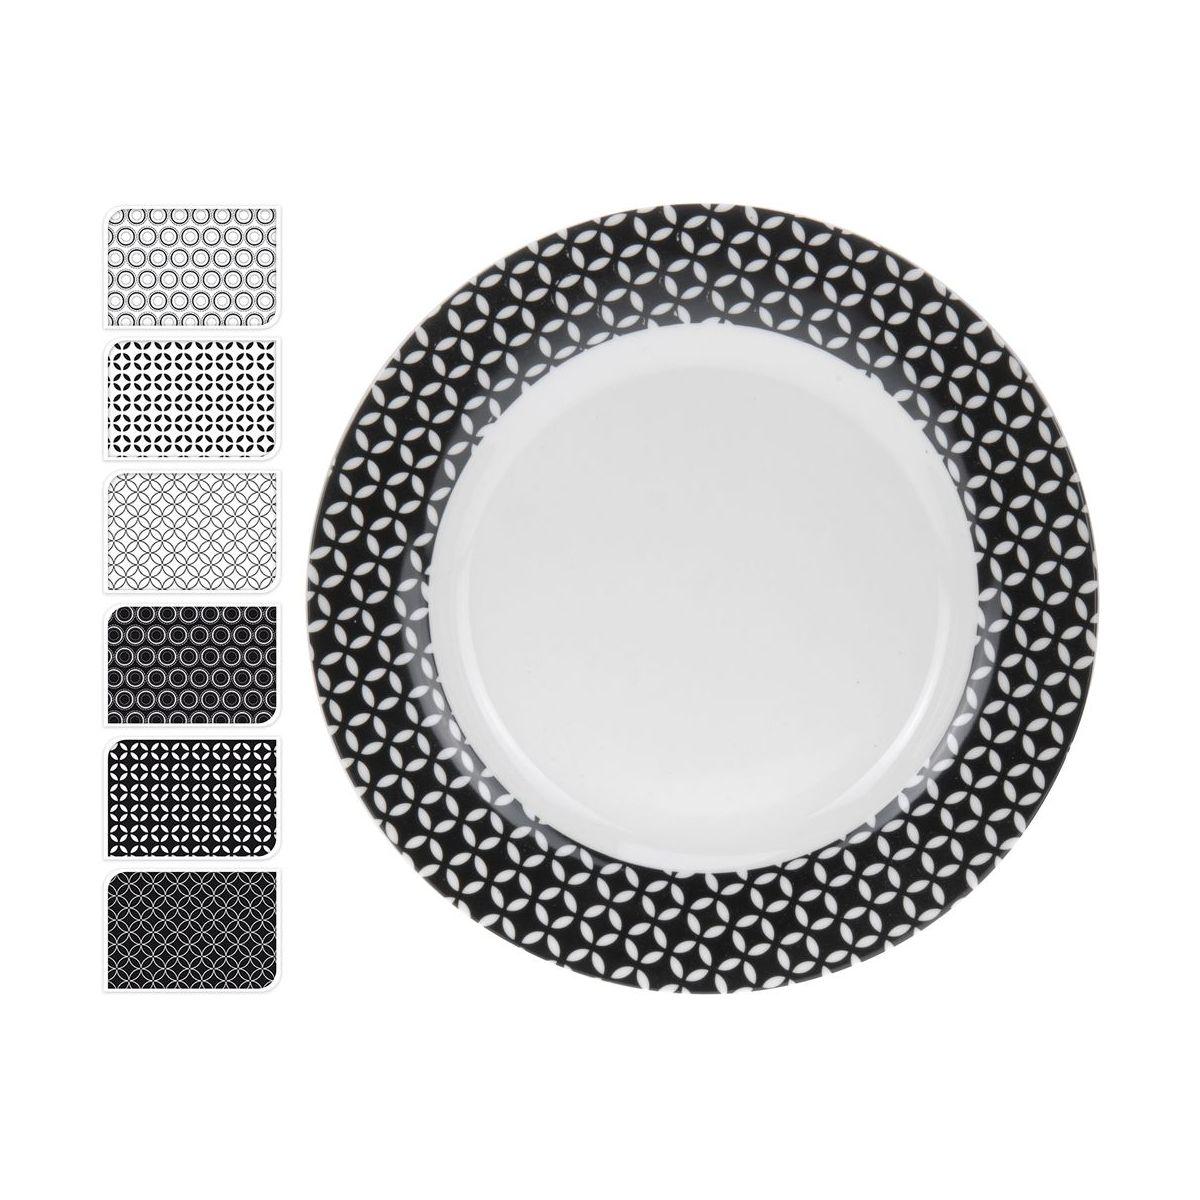 Тарелка в ассортиментеТарелка, диаметром 20,5 см, от бренда Тоалла, представлена в ассортименте.<br>